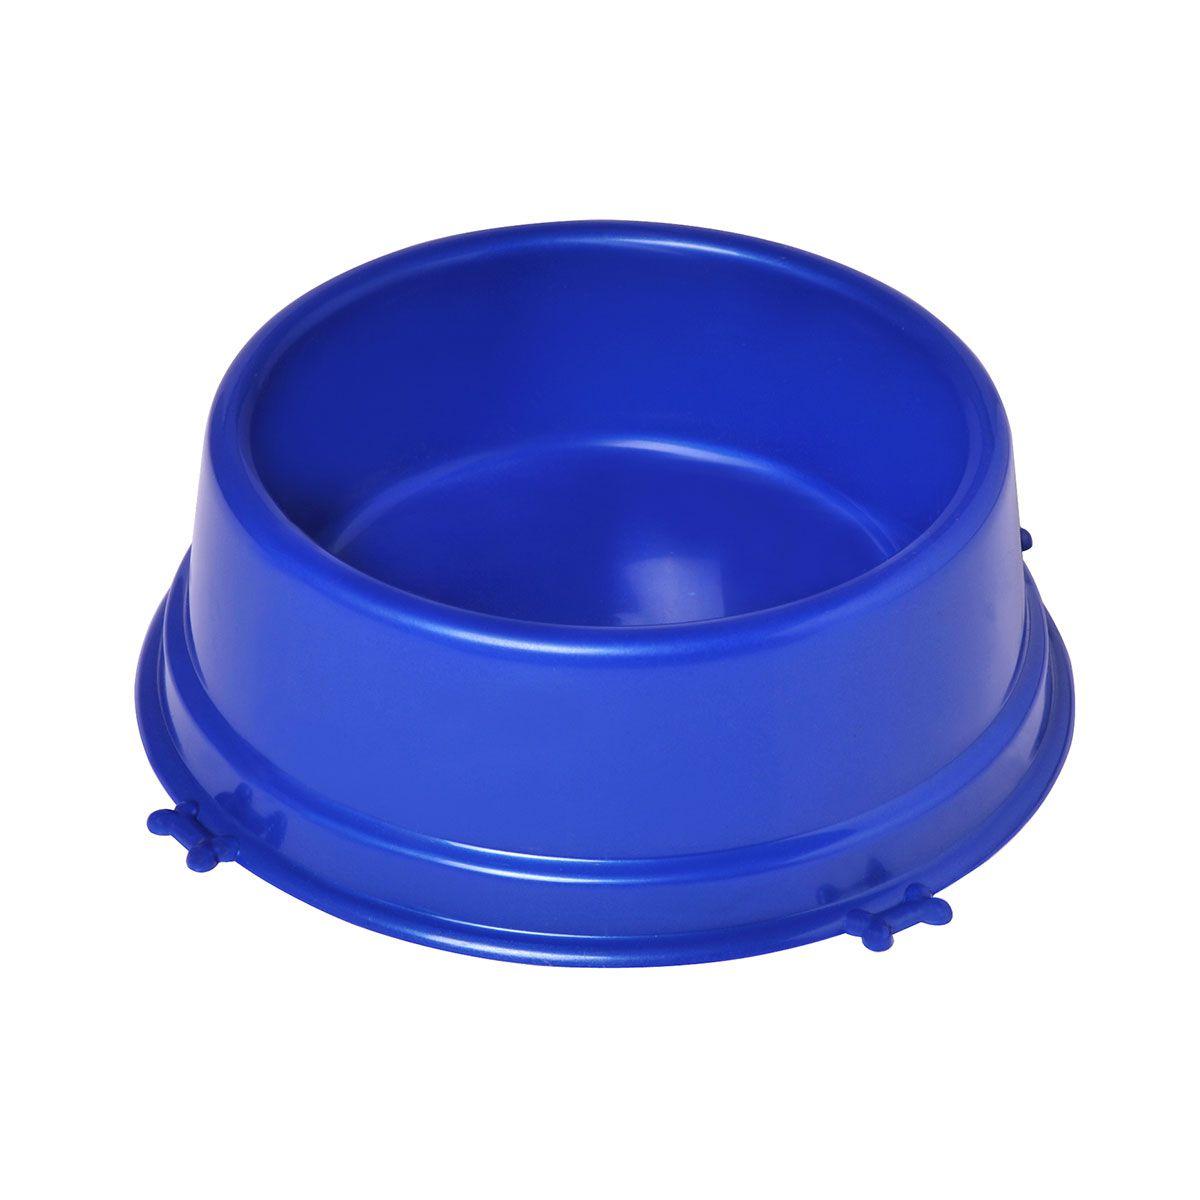 Comedouro Caes Perolizado Medio 1100 Ml Azul